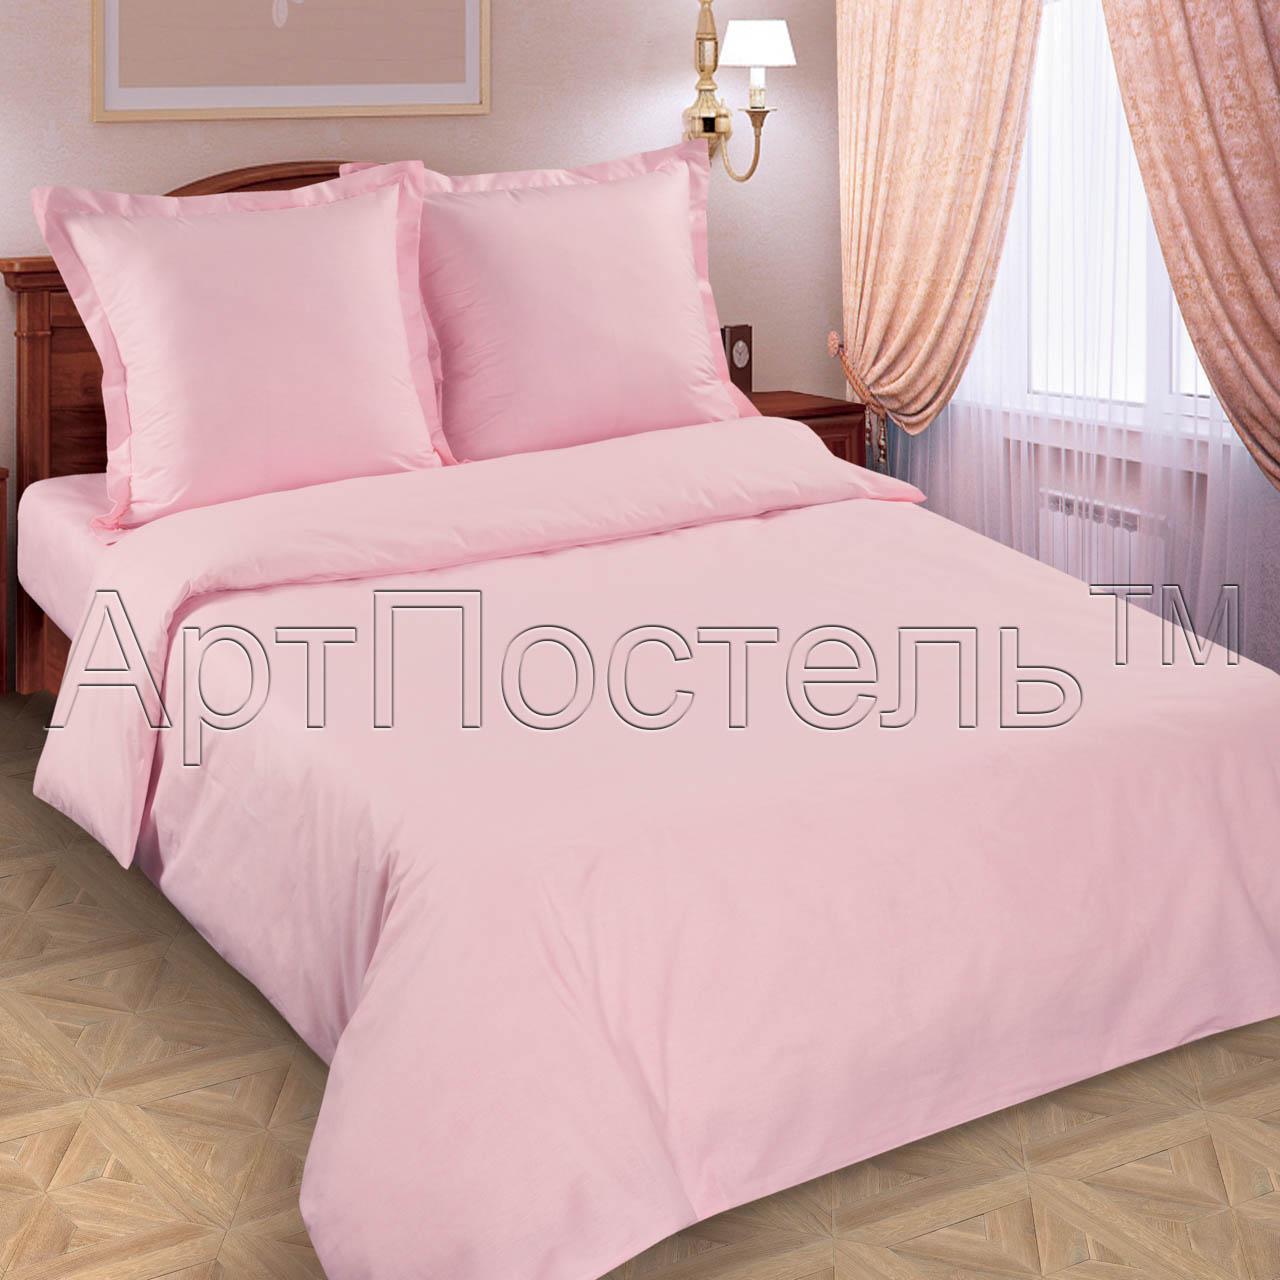 Комплект Роза, размер ЕвроПоплин<br>Плотность ткани: 115 г/кв. м <br>Пододеяльник: 217х200 см - 1 шт. <br>Простыня: 220х240 см - 1 шт. <br>Наволочка: 70х70 см - 2 шт.<br><br>Тип: КПБ<br>Размер: Евро<br>Материал: Поплин